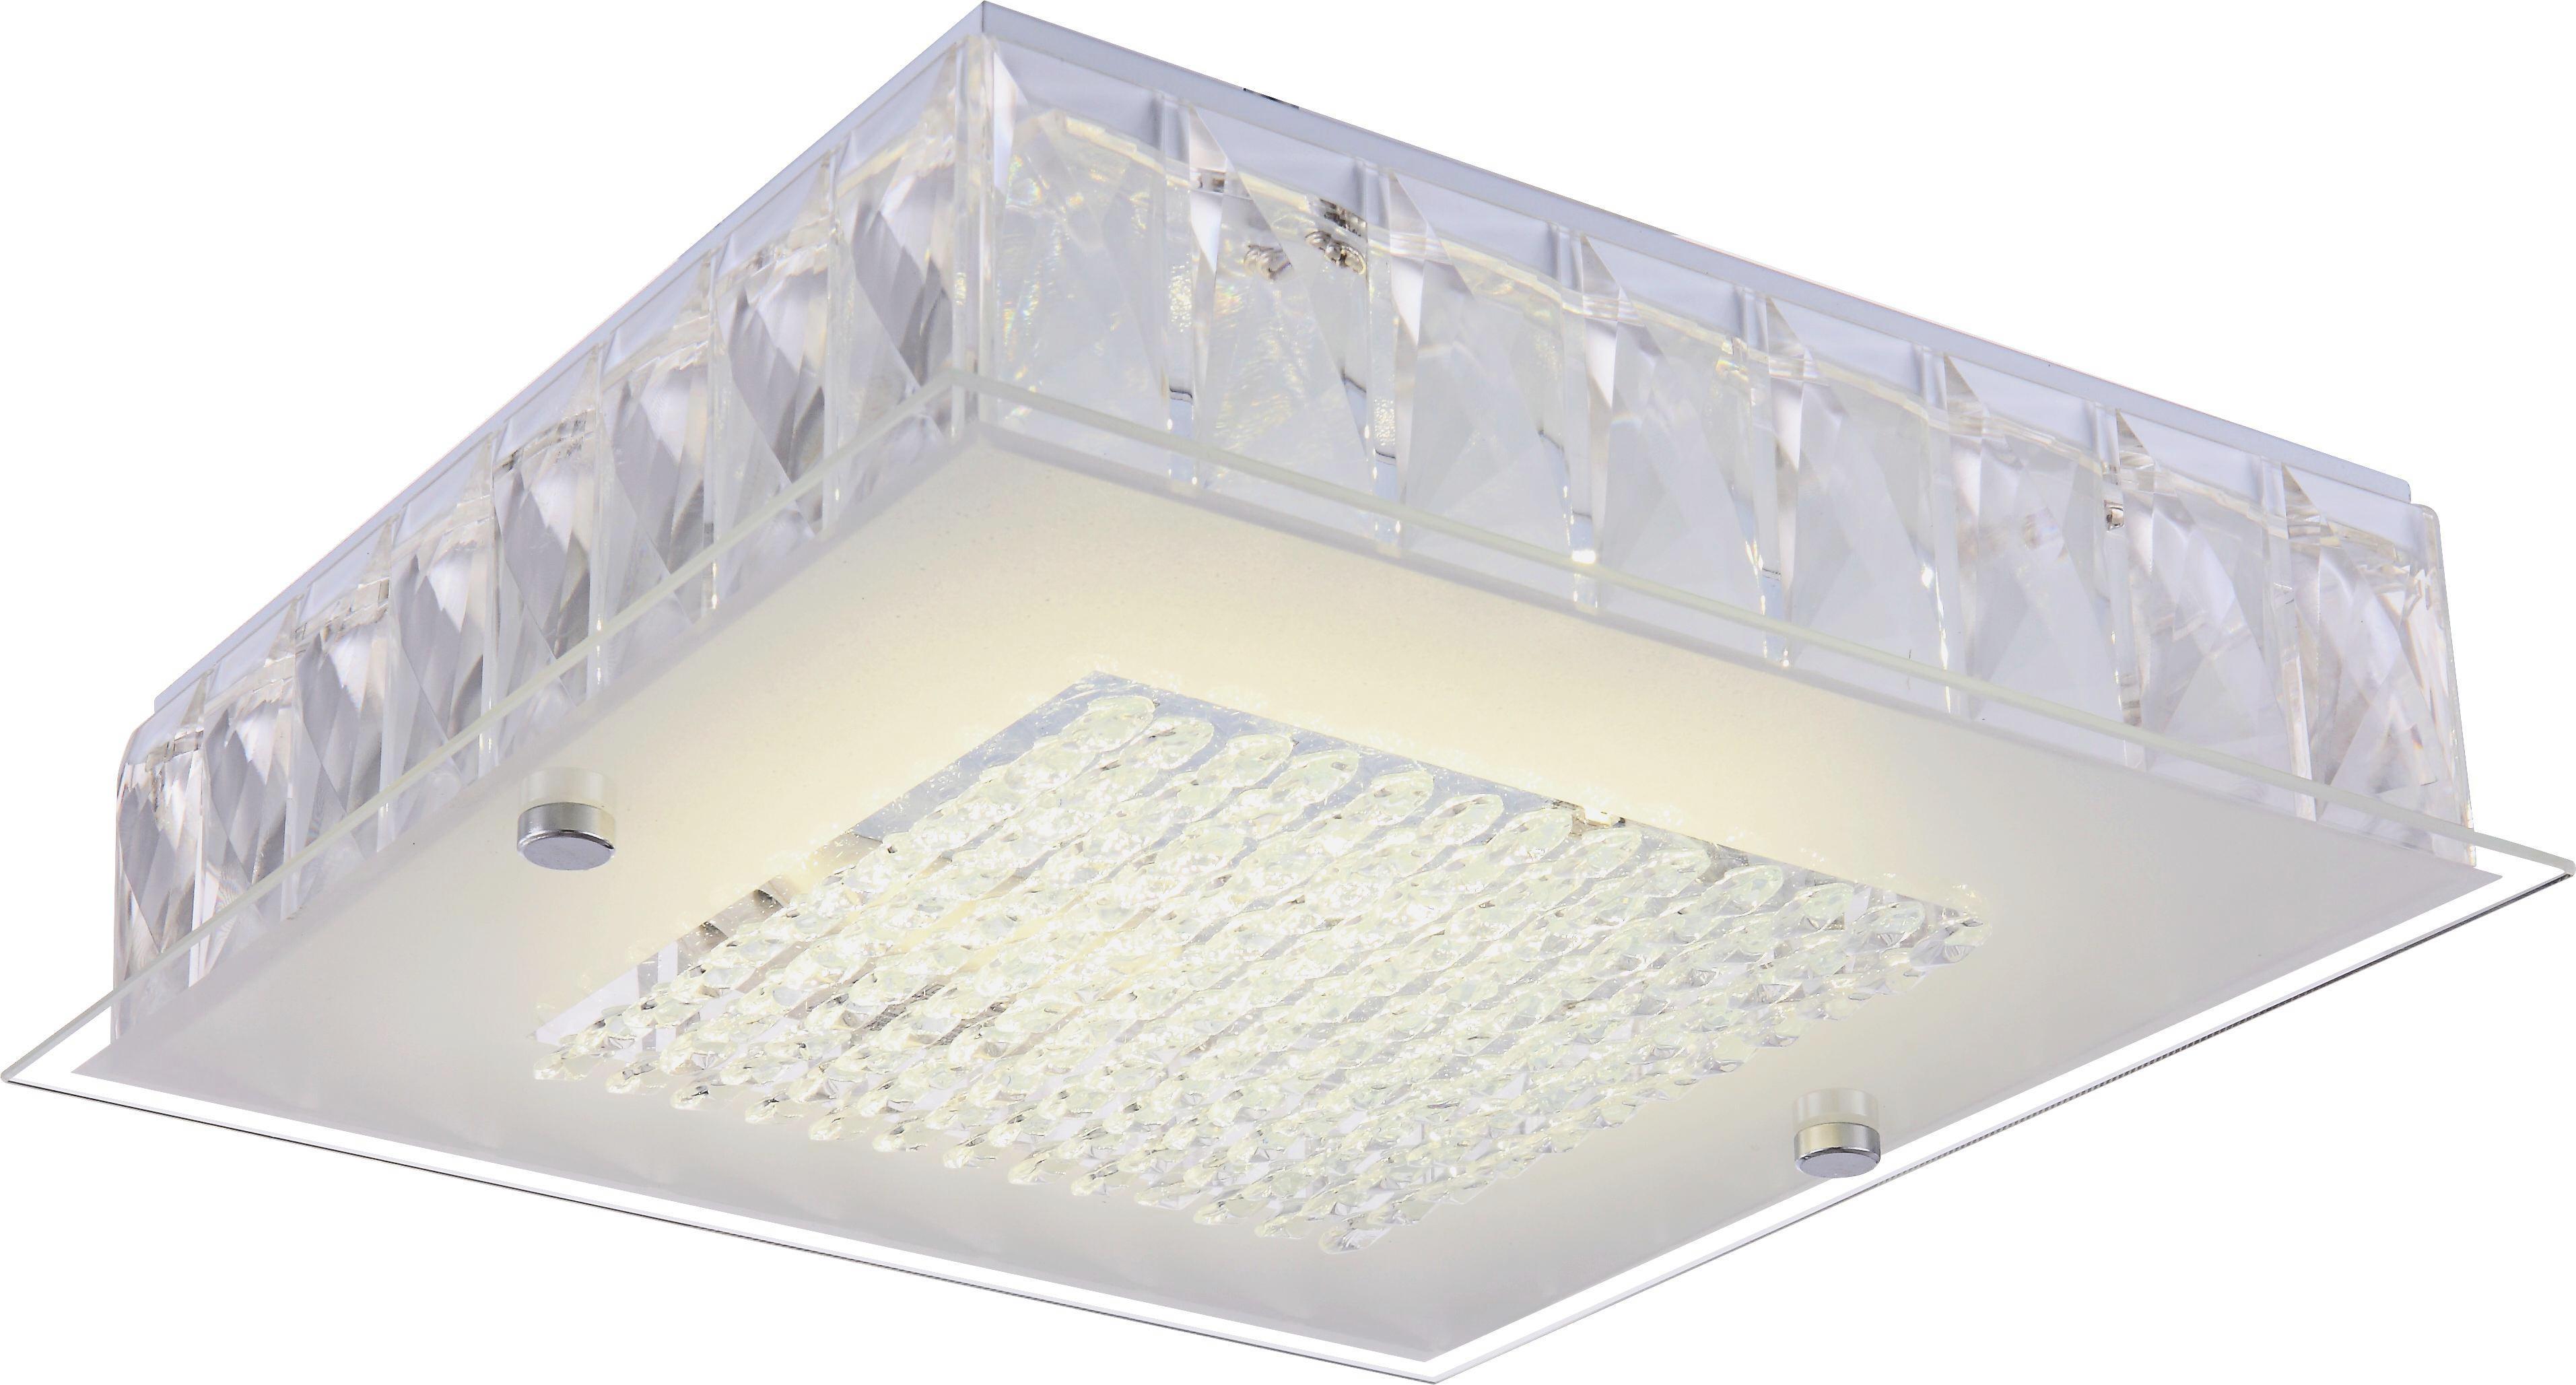 Deckenleuchte Keara, max. 12 Watt - Weiß, MODERN, Glas/Metall (30/30/8cm) - MÖMAX modern living